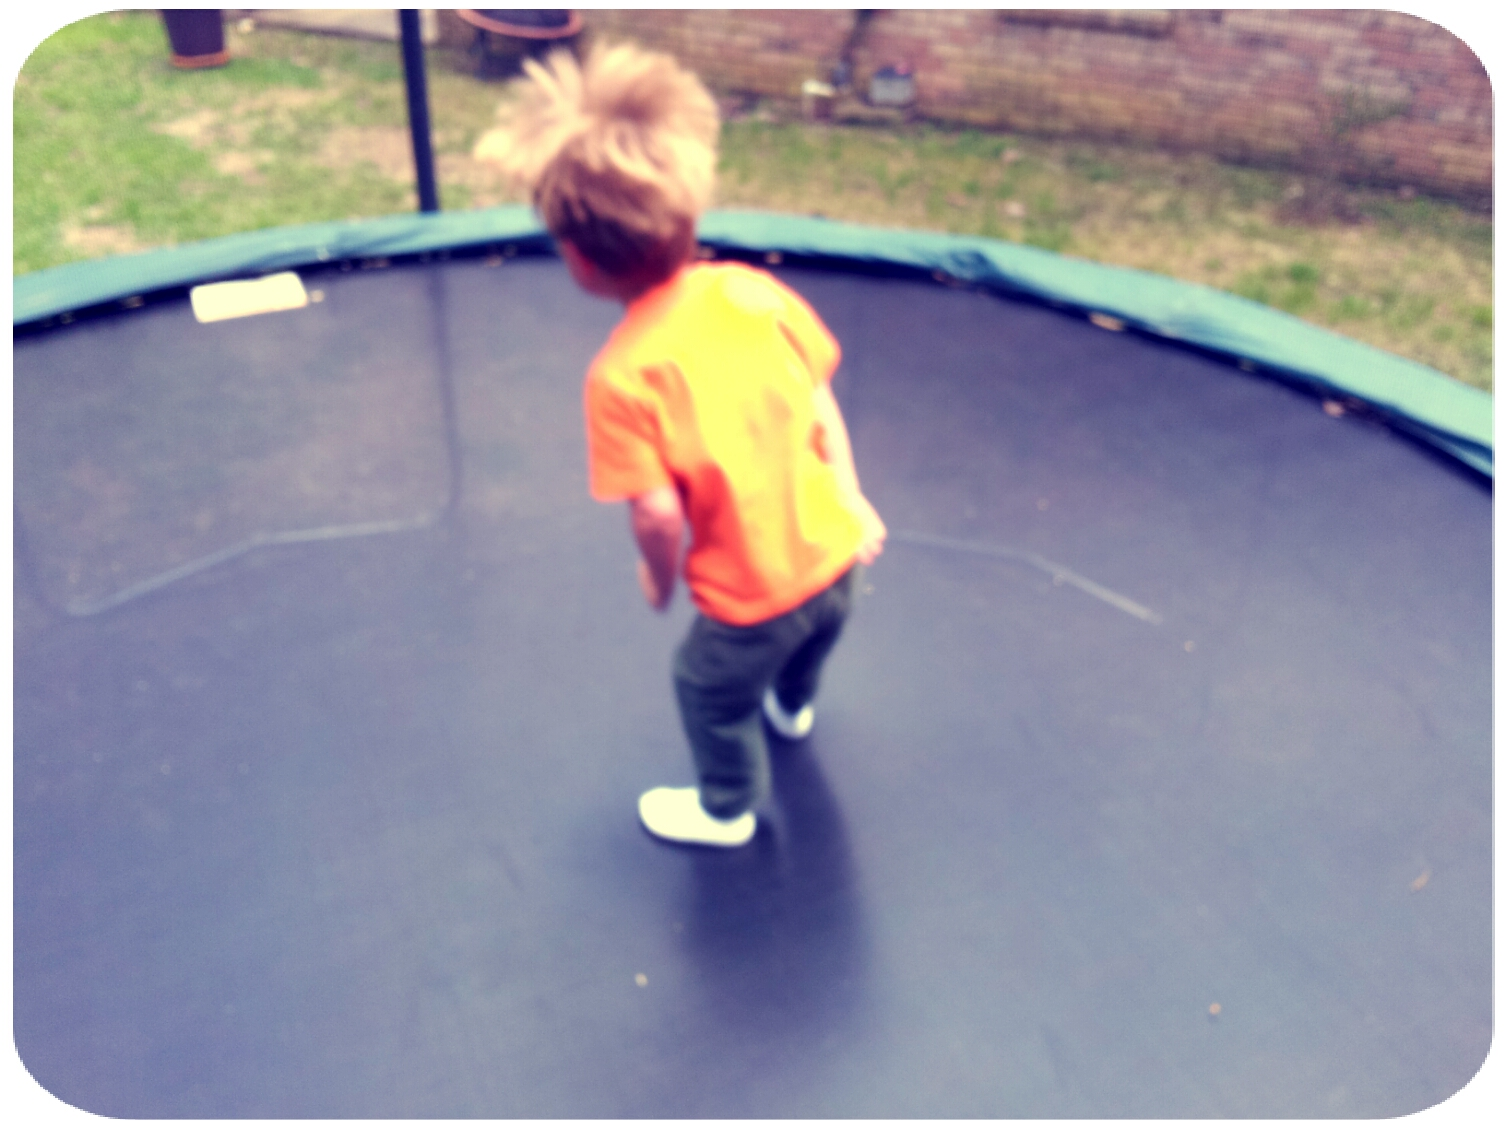 2012-04-27 13.54.39_Josh_Round.jpg